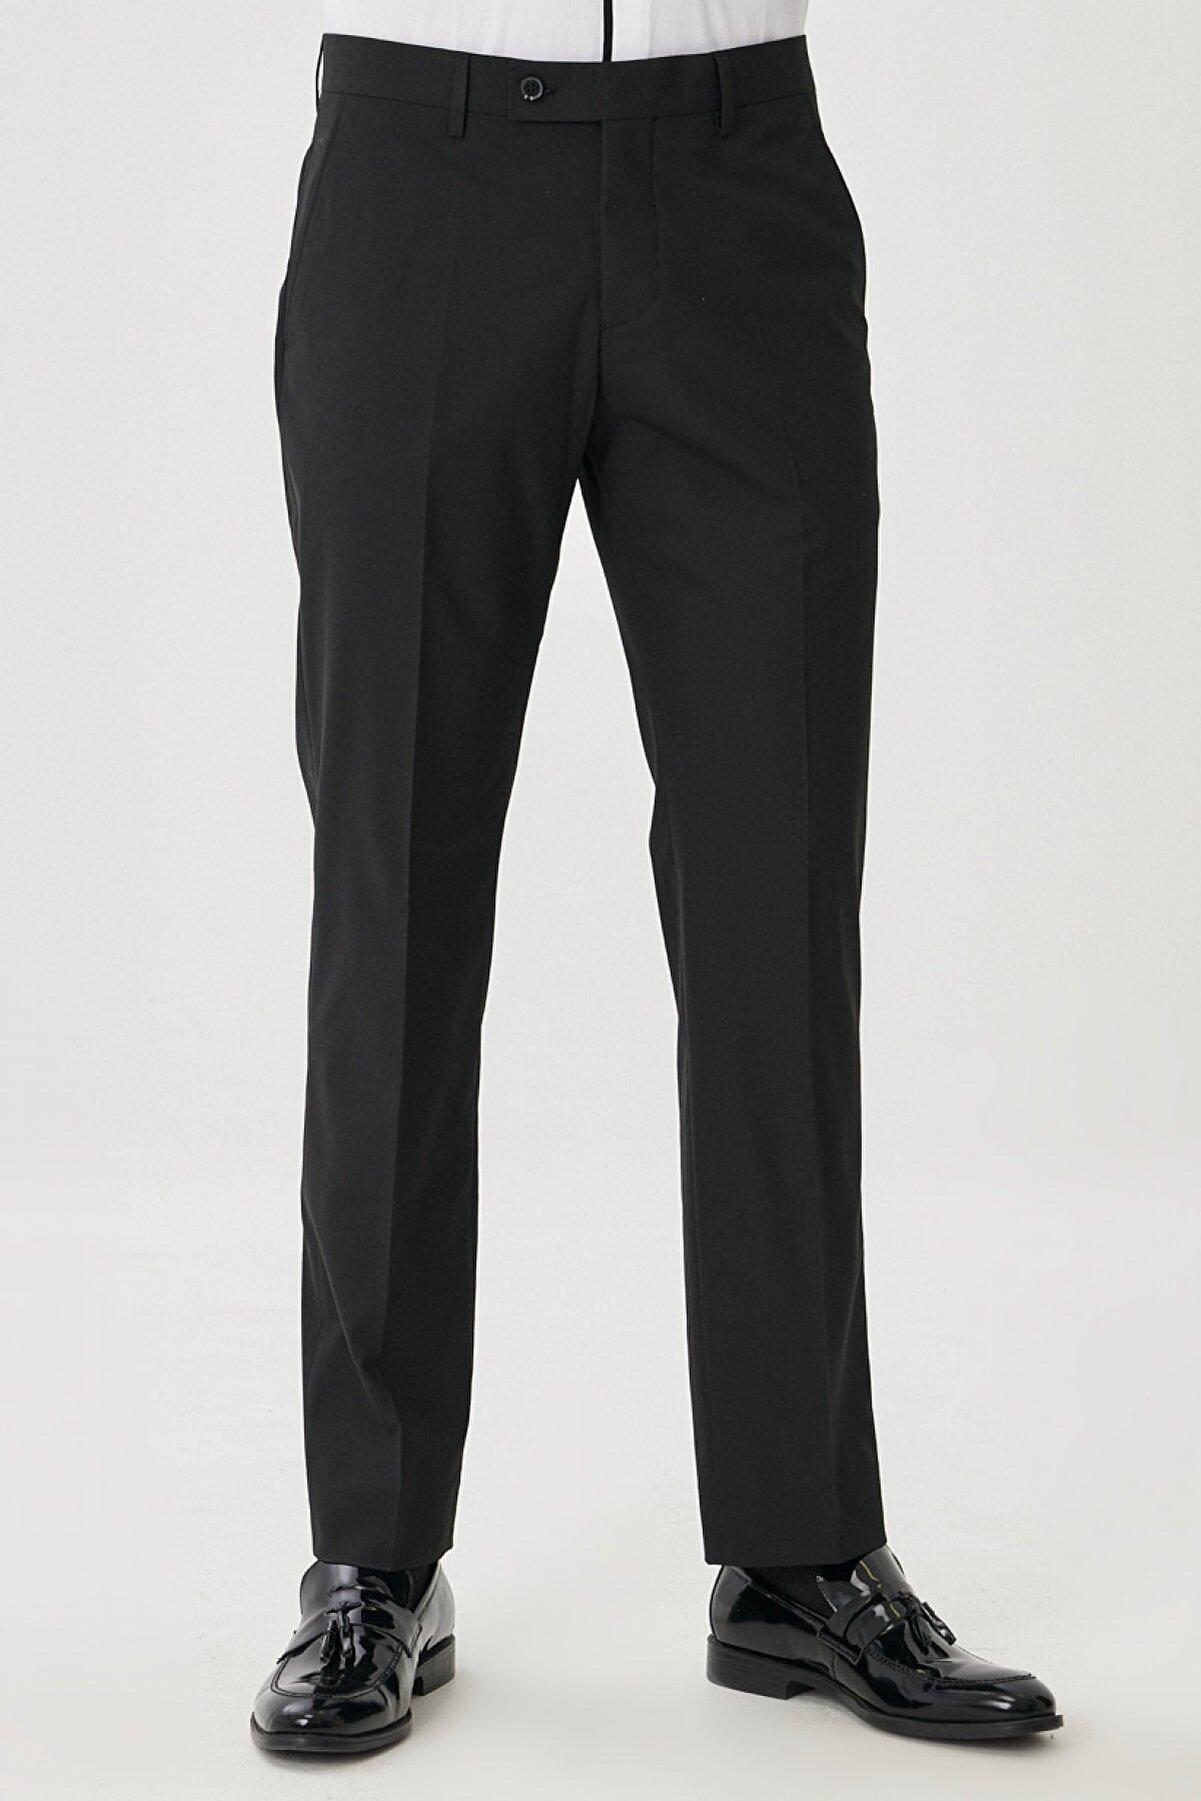 Altınyıldız Classics Erkek Siyah Regular Fit Klasik Pantolon